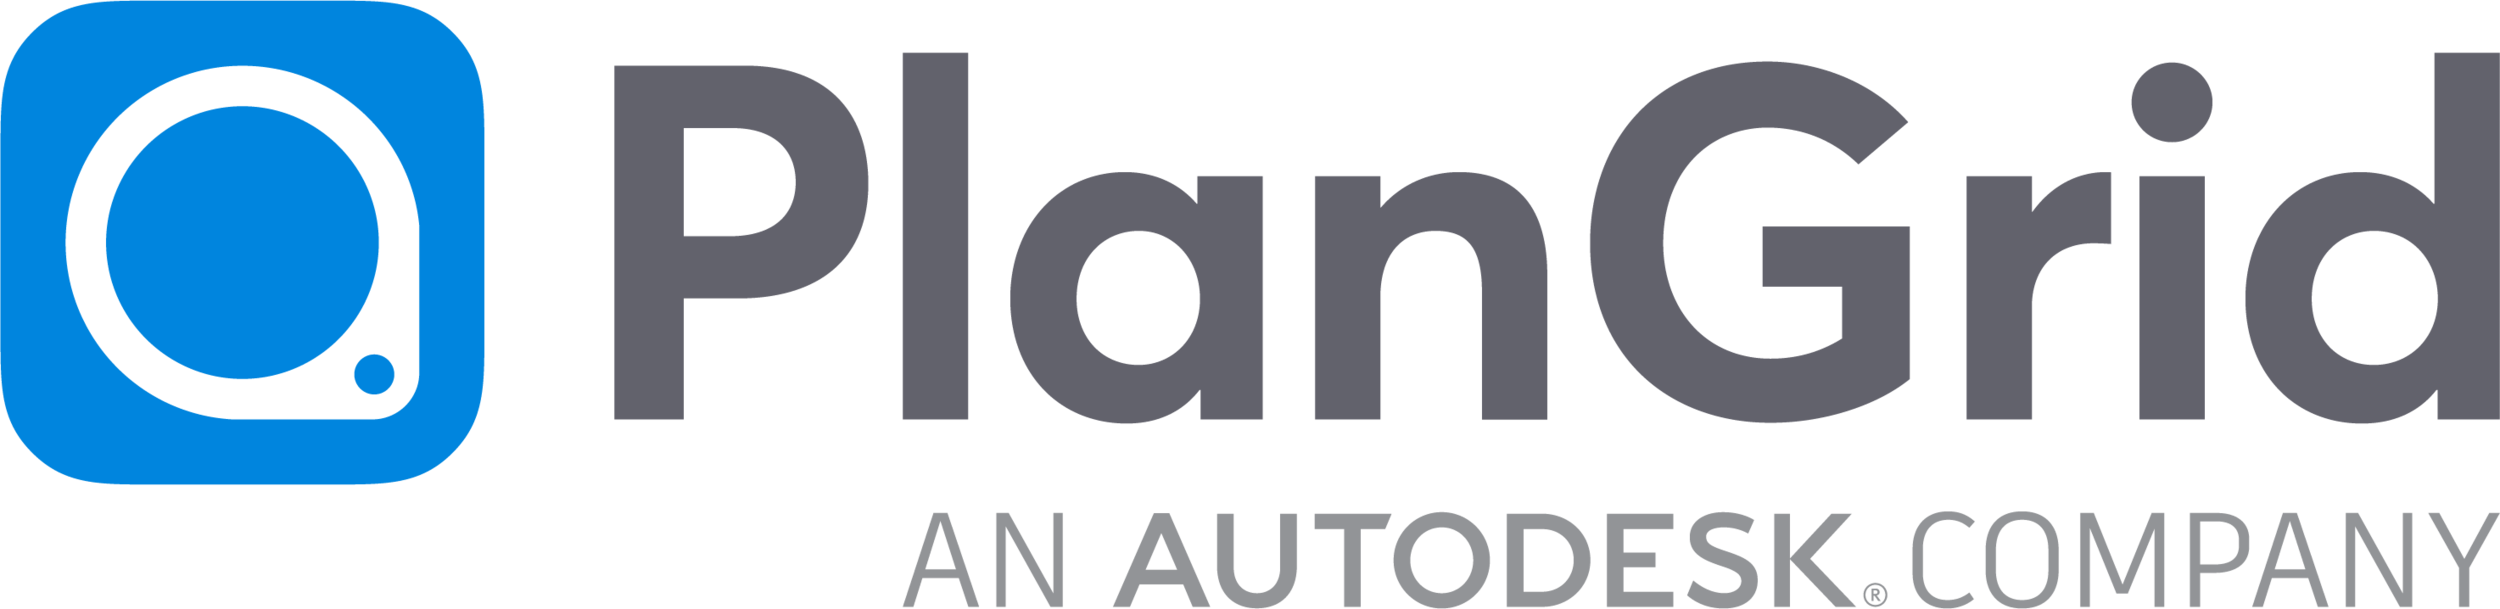 PlanGrid logo.png